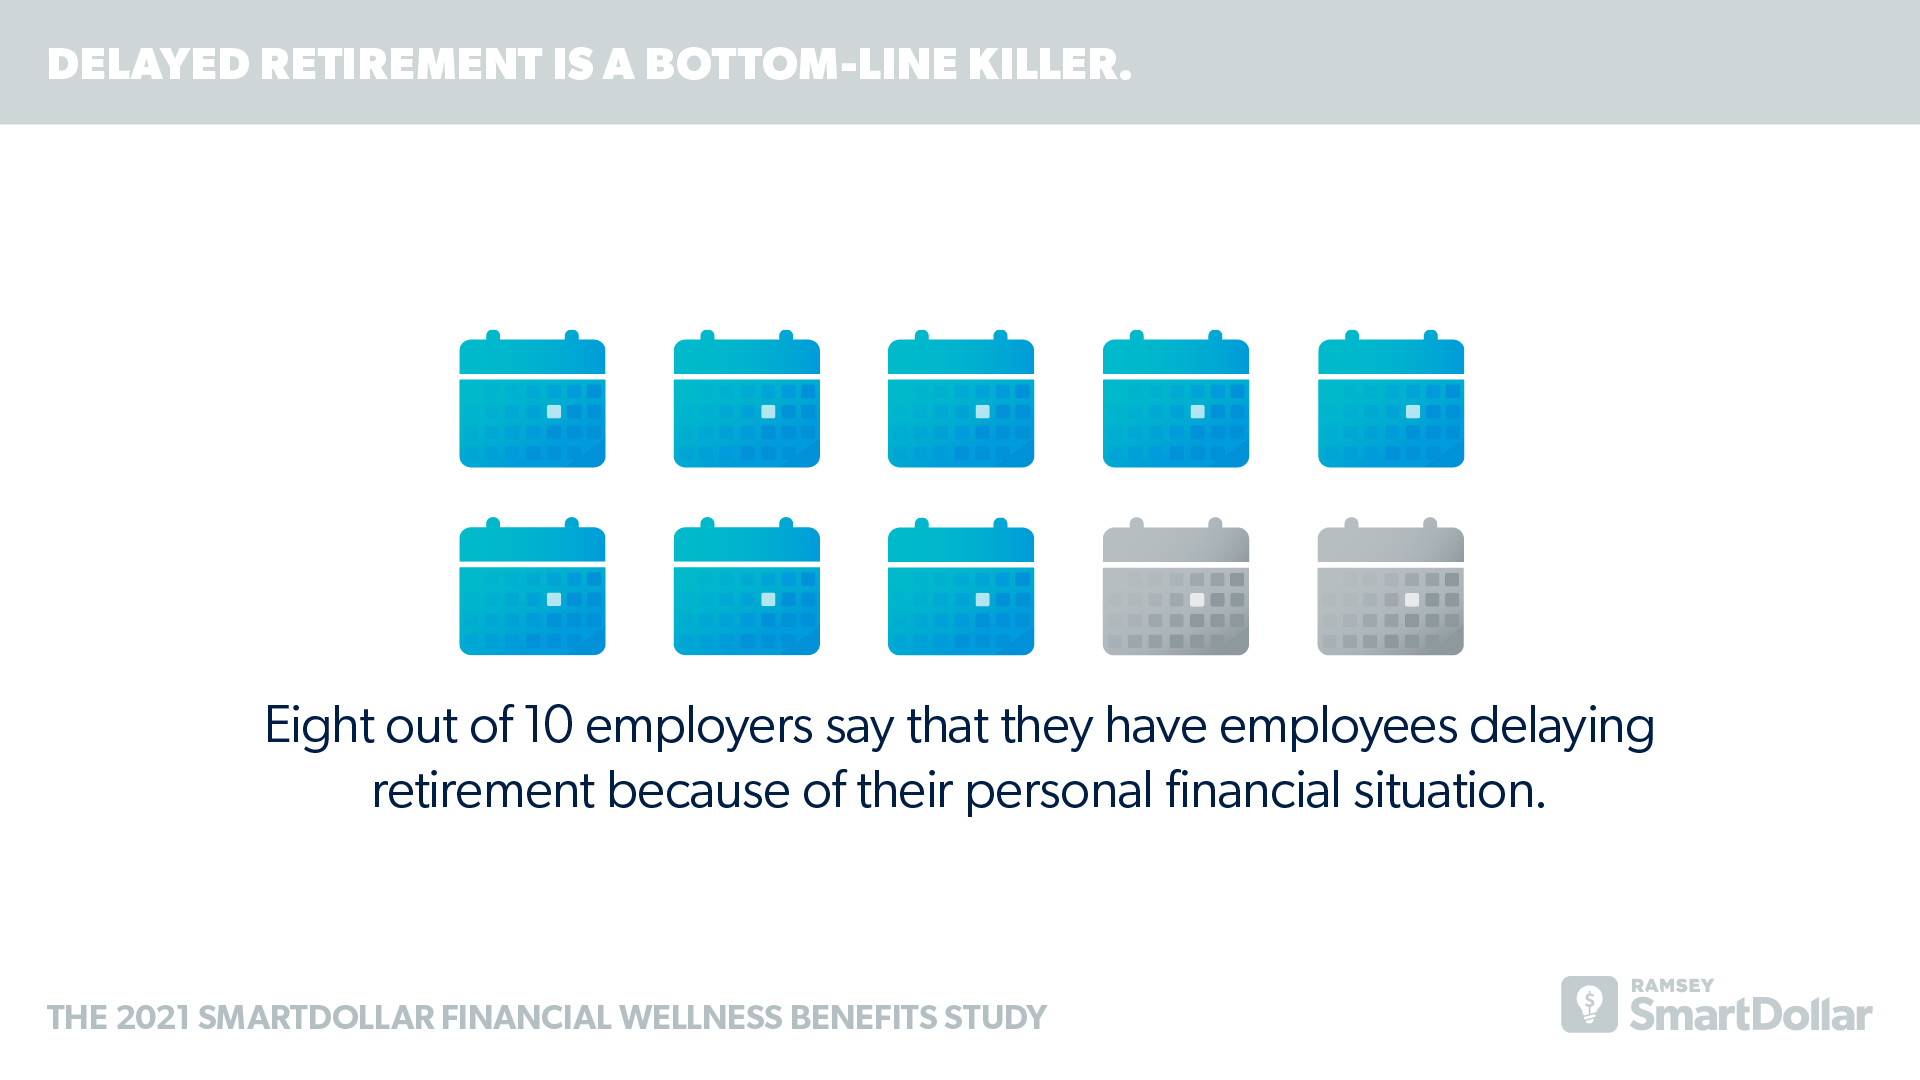 Delayed Retirement is a Bottom-Line Killer.